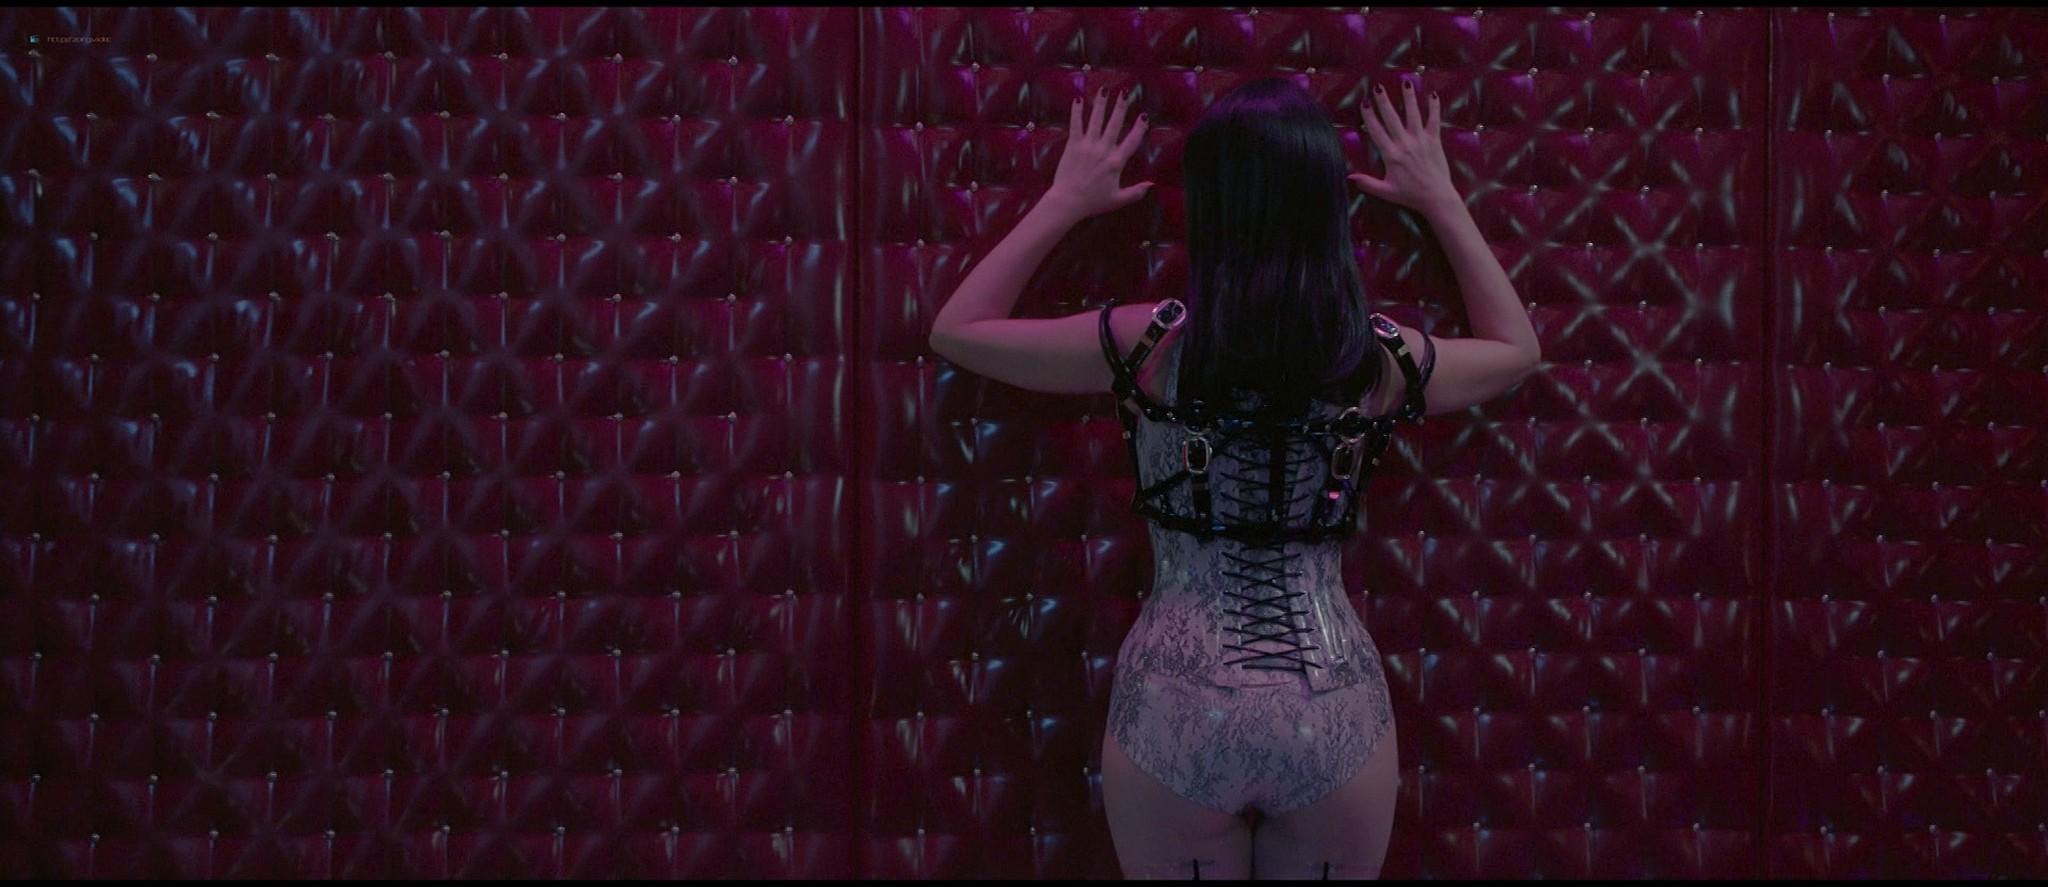 Emmanuelle Béart nude brief topless - My Mistress (AU-2014) HD 1080p BluRay (12)